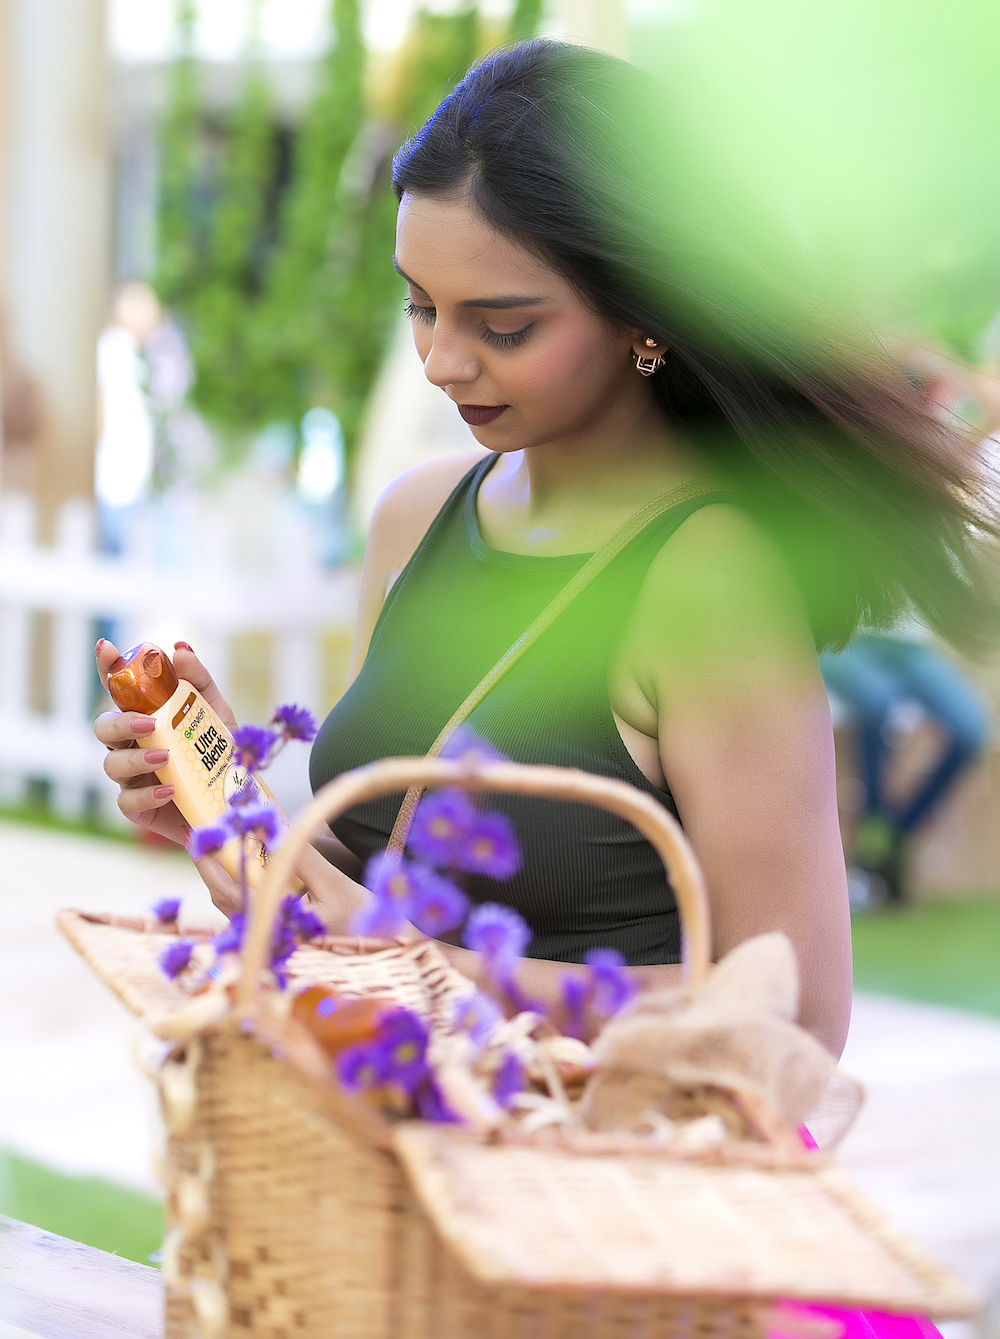 Garnier Ultra Blends Launch Event Personal Style 3